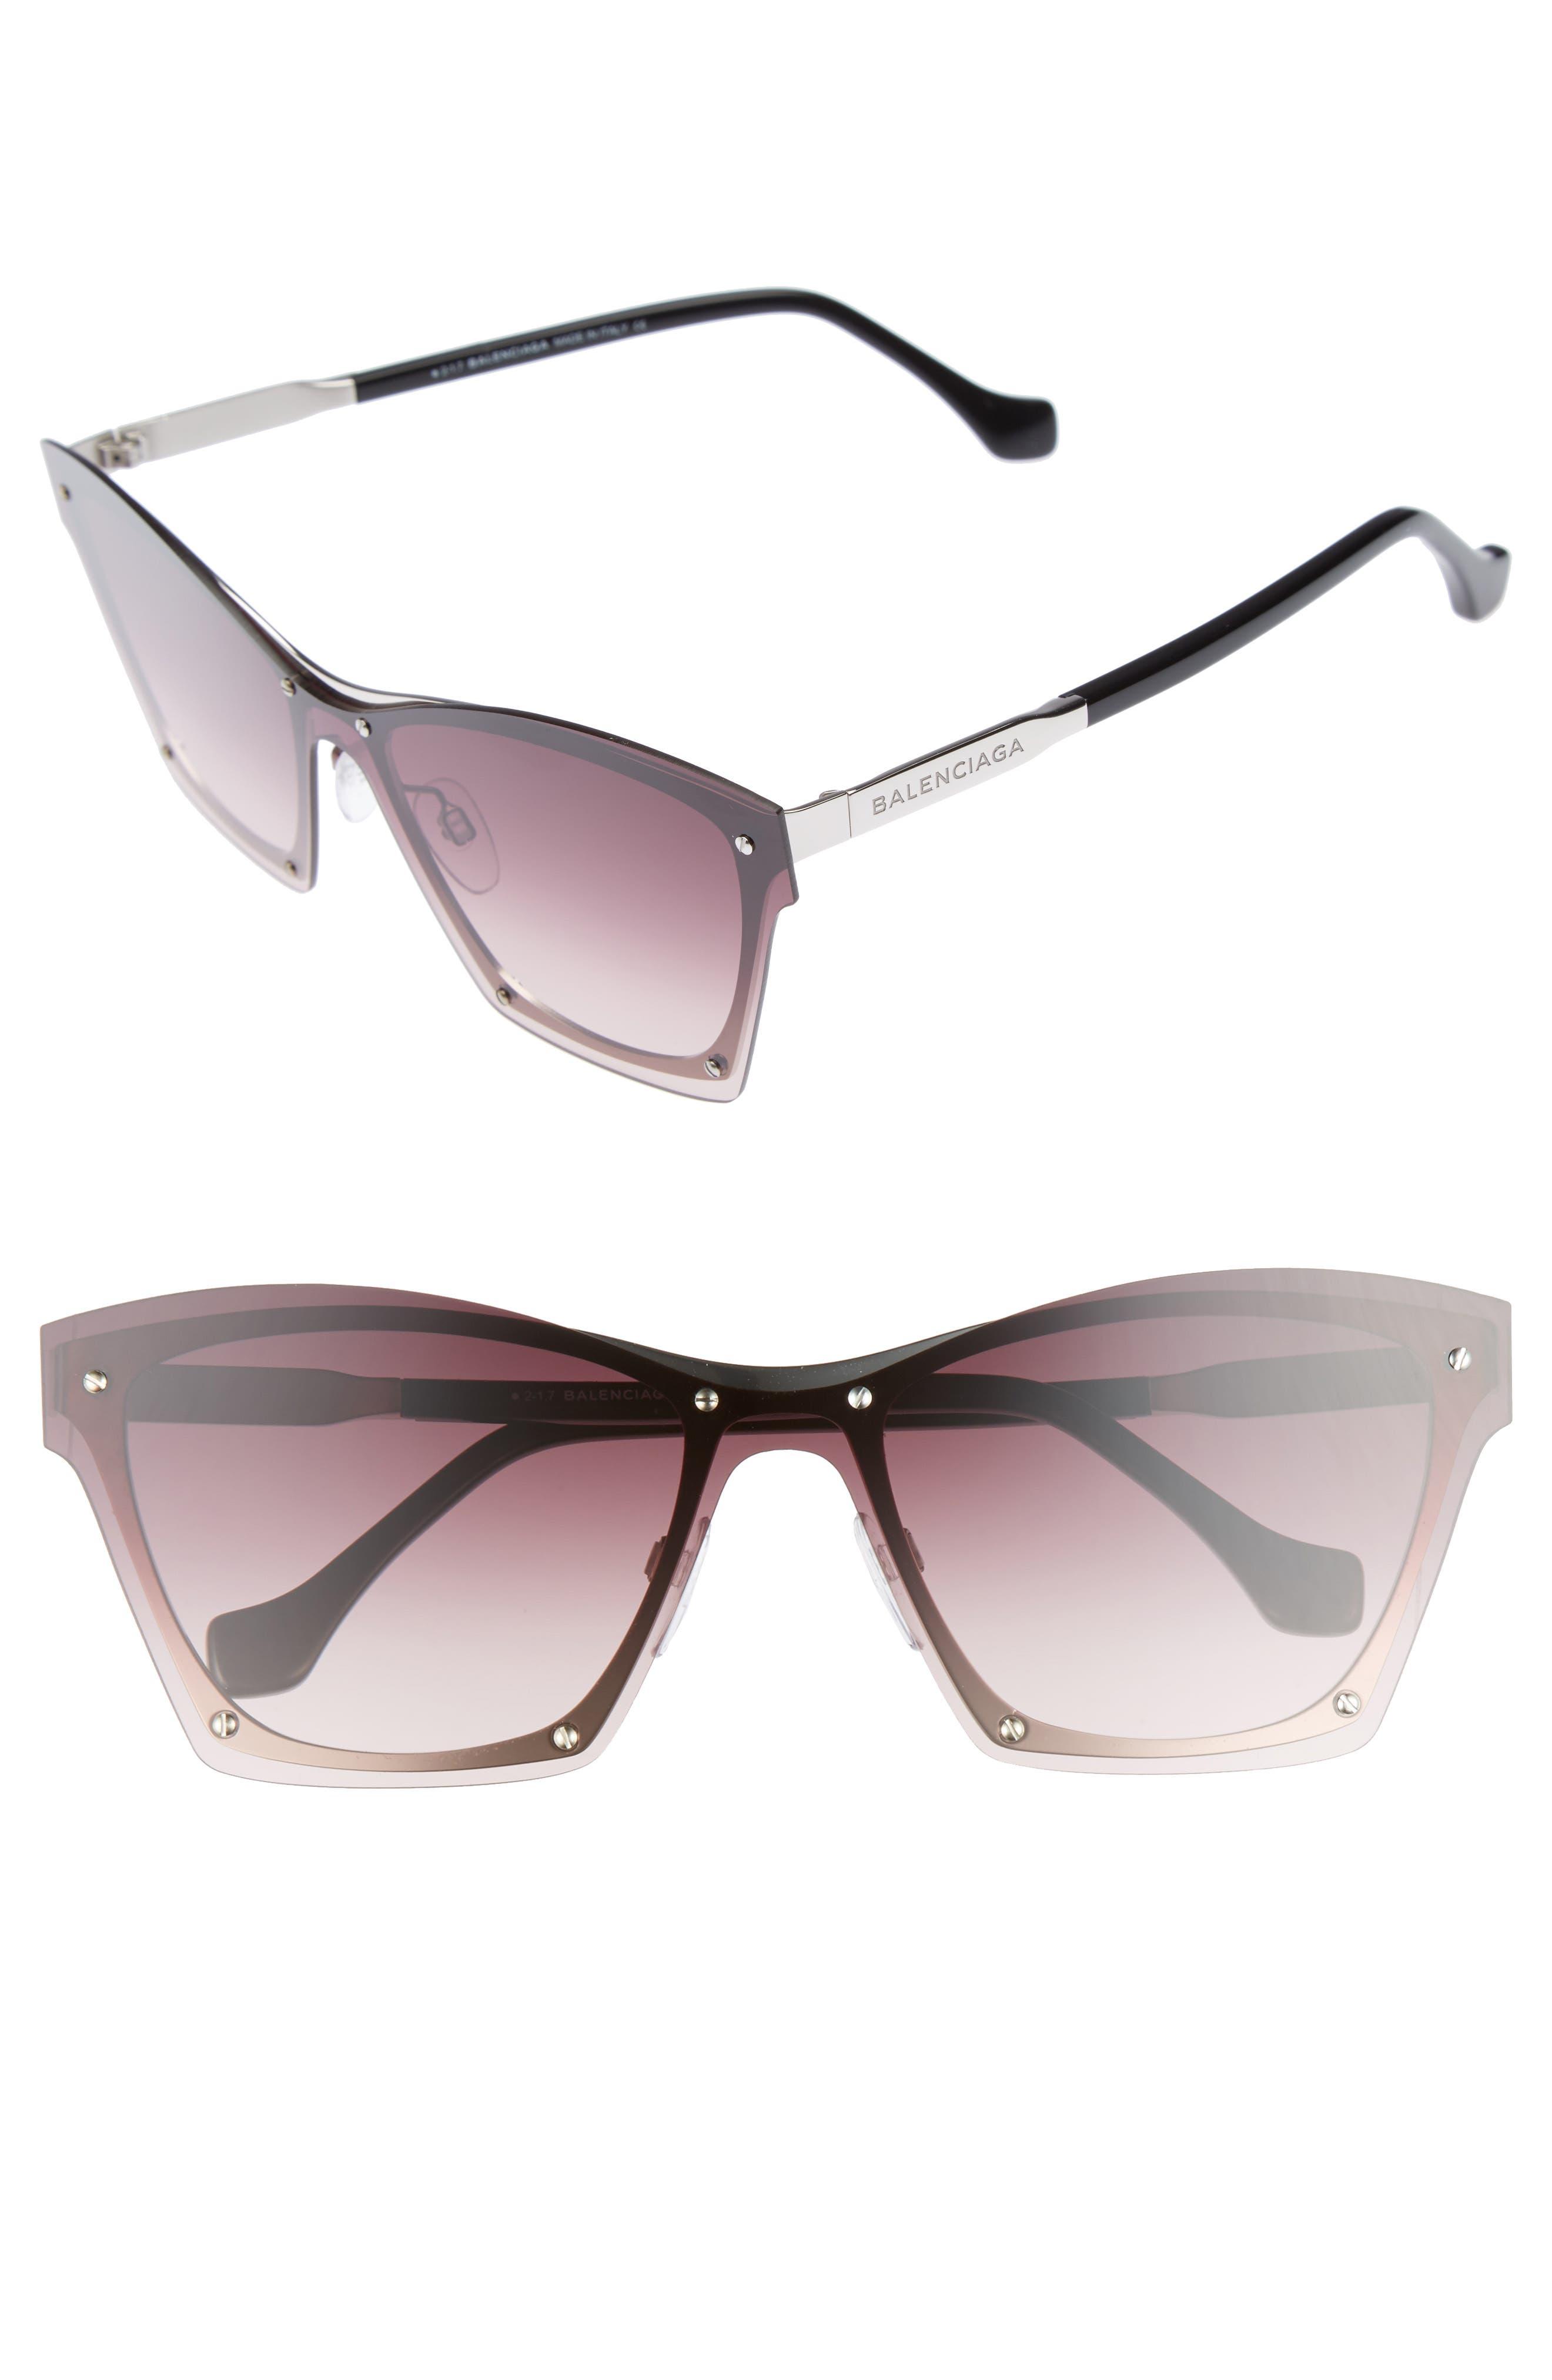 55mm Frameless Sunglasses,                         Main,                         color, Palladium Blk/ Grdent Bordeaux